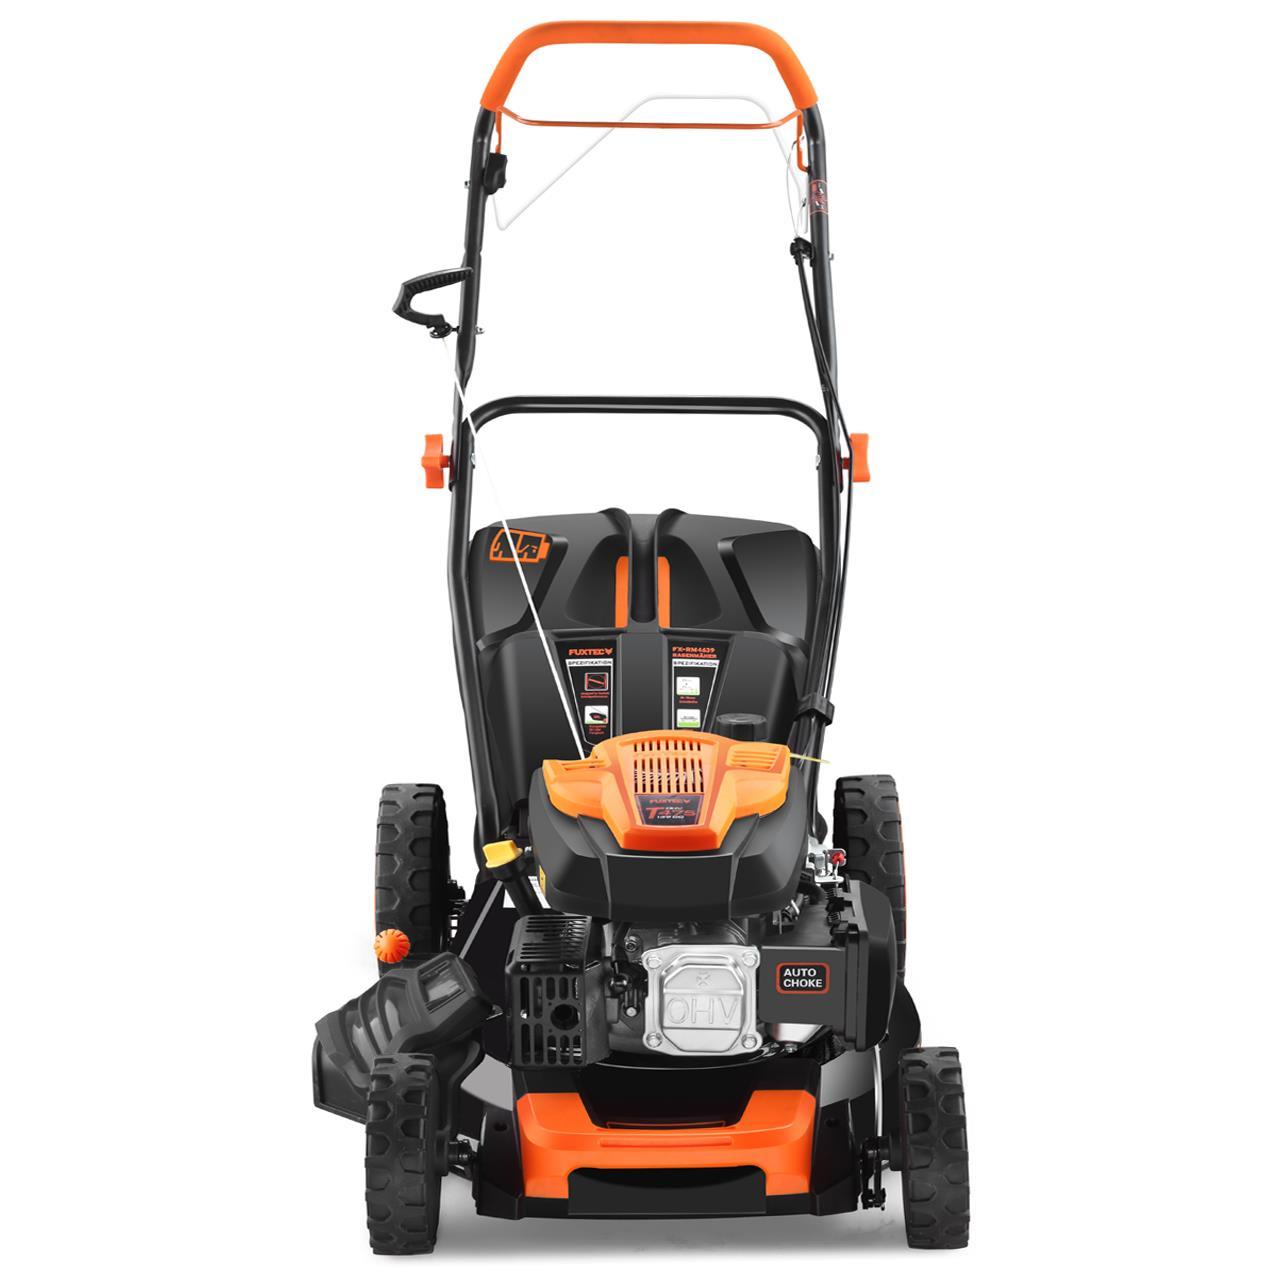 FUXTEC-Benzin-Rasenmaeher-FX-RM4639-Motormaeher-139ccm-Maeher-Benzinmaeher-4PS